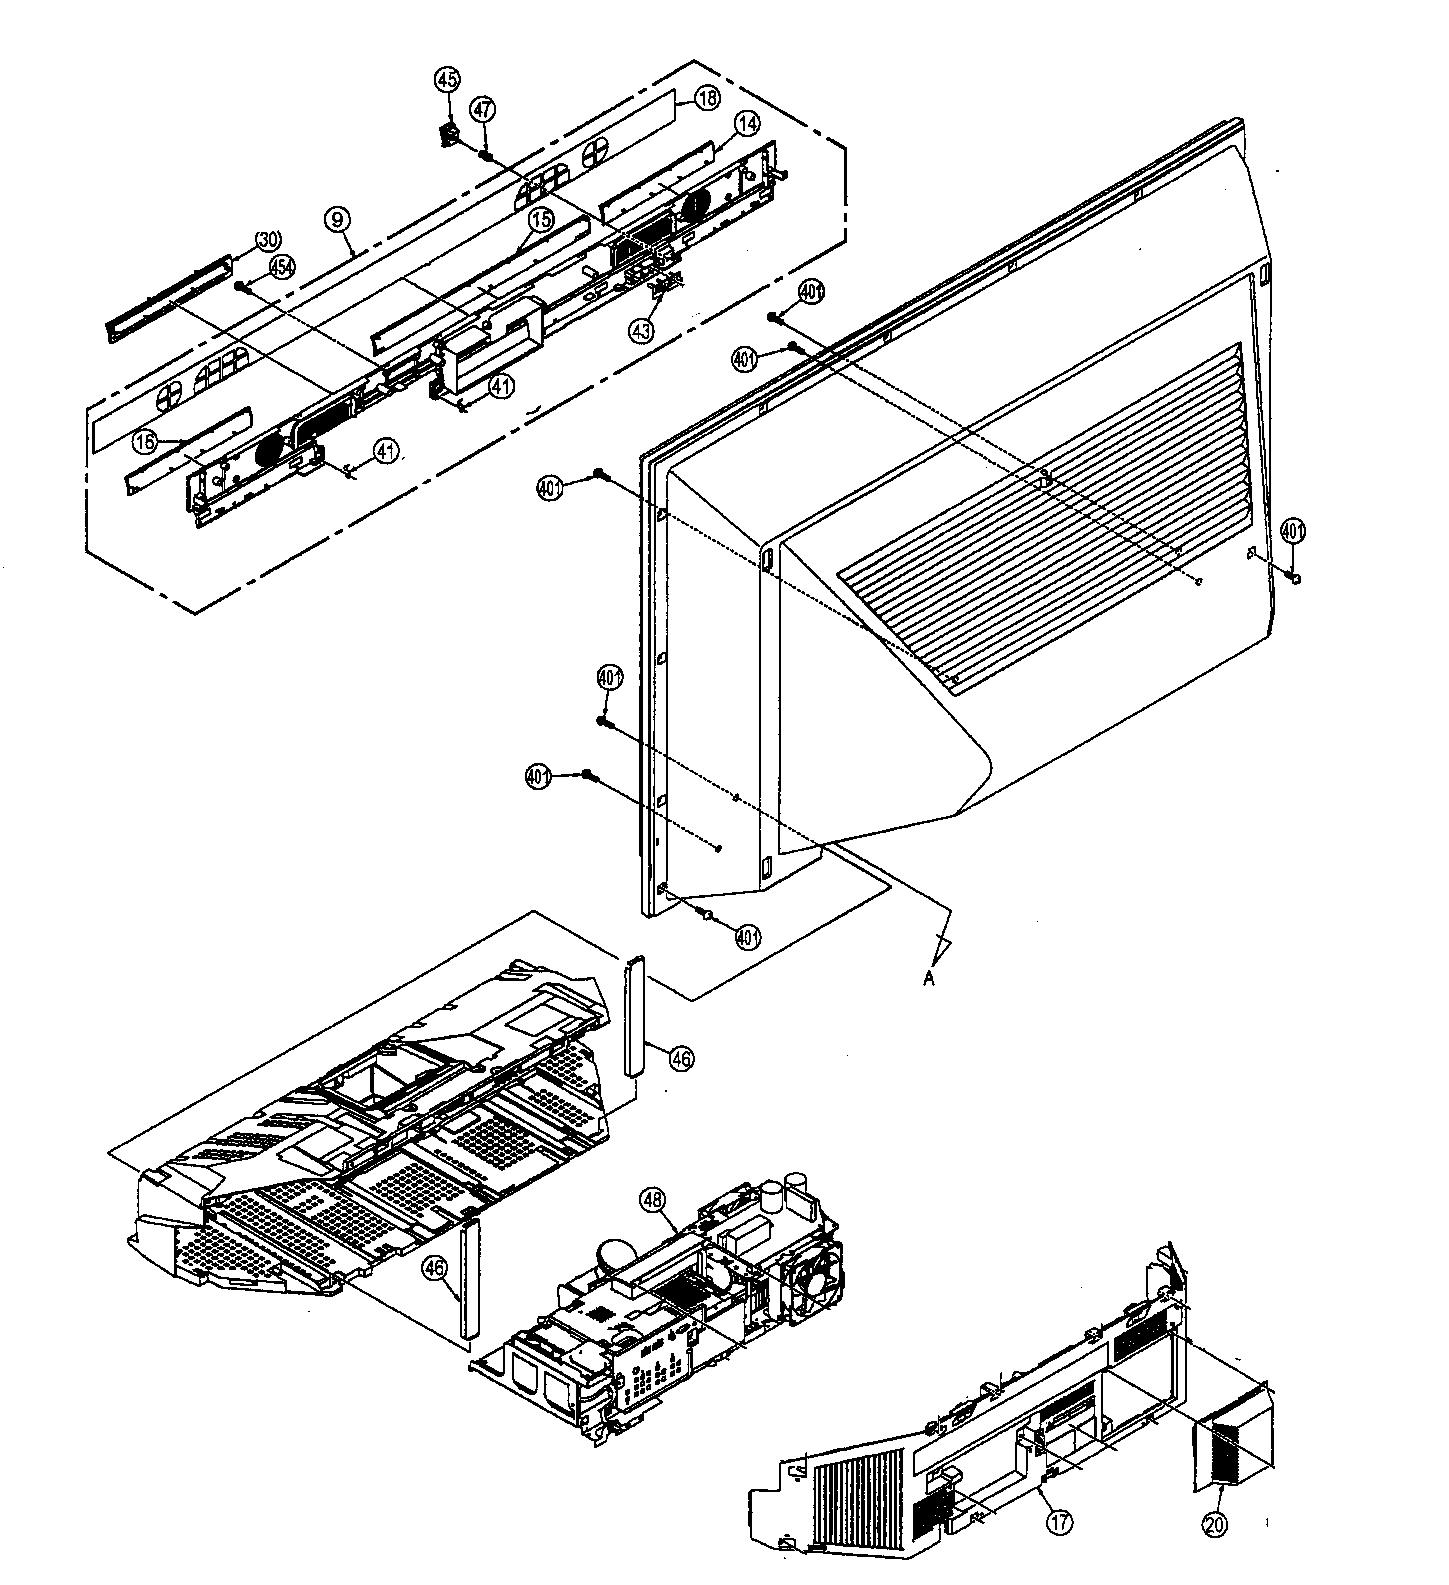 Panasonic model PT-61LCZ7 lcd television genuine parts